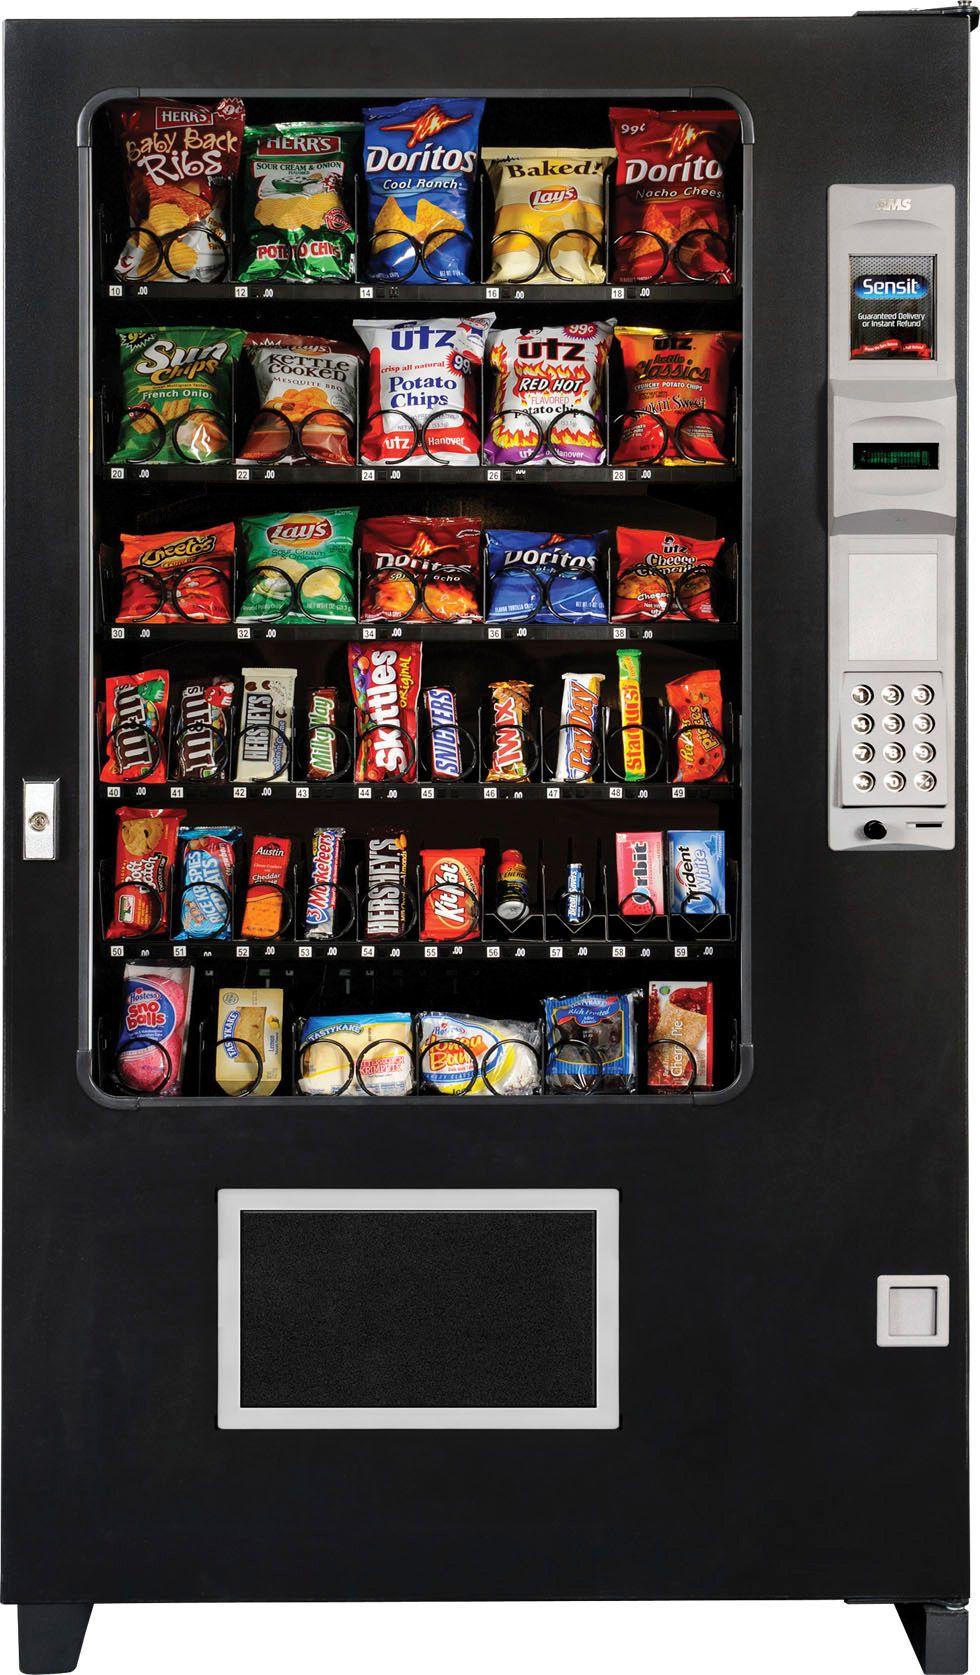 Whether you want snack vending, cigarette vending, amusement